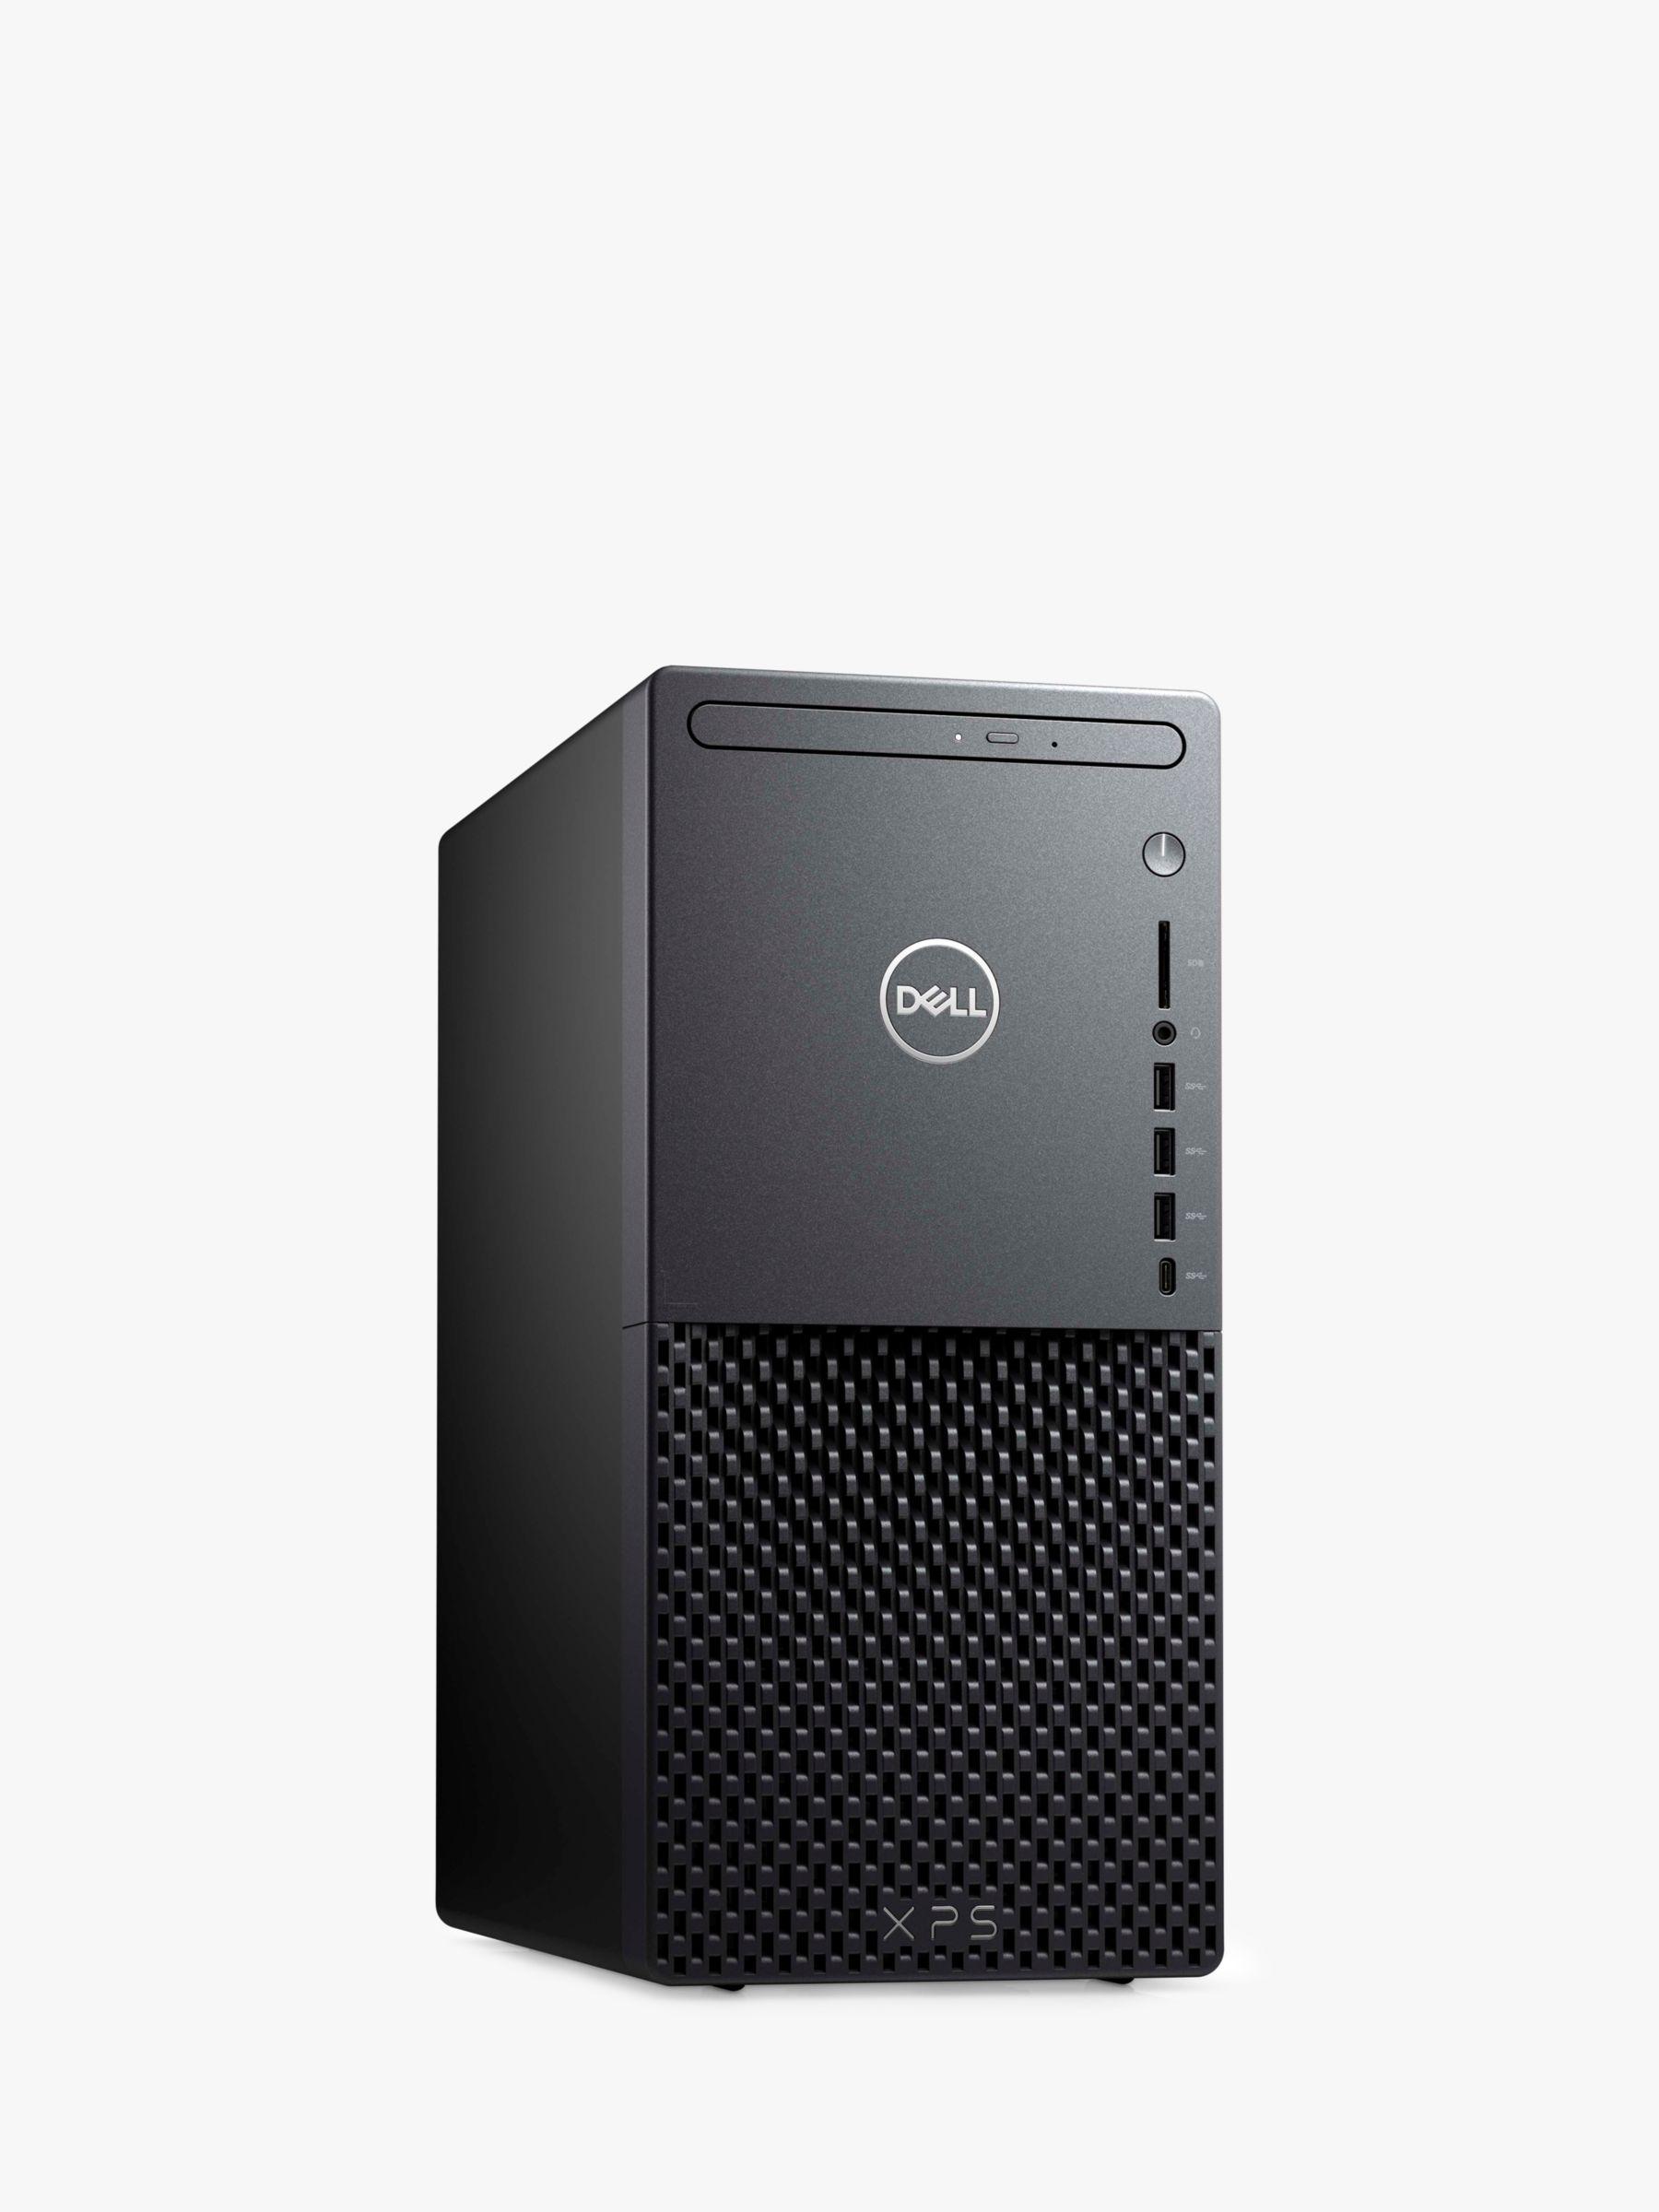 Dell XPS 8940 Desktop PC, Intel Core i5 Processor, 8GB RAM, 256GB SSD